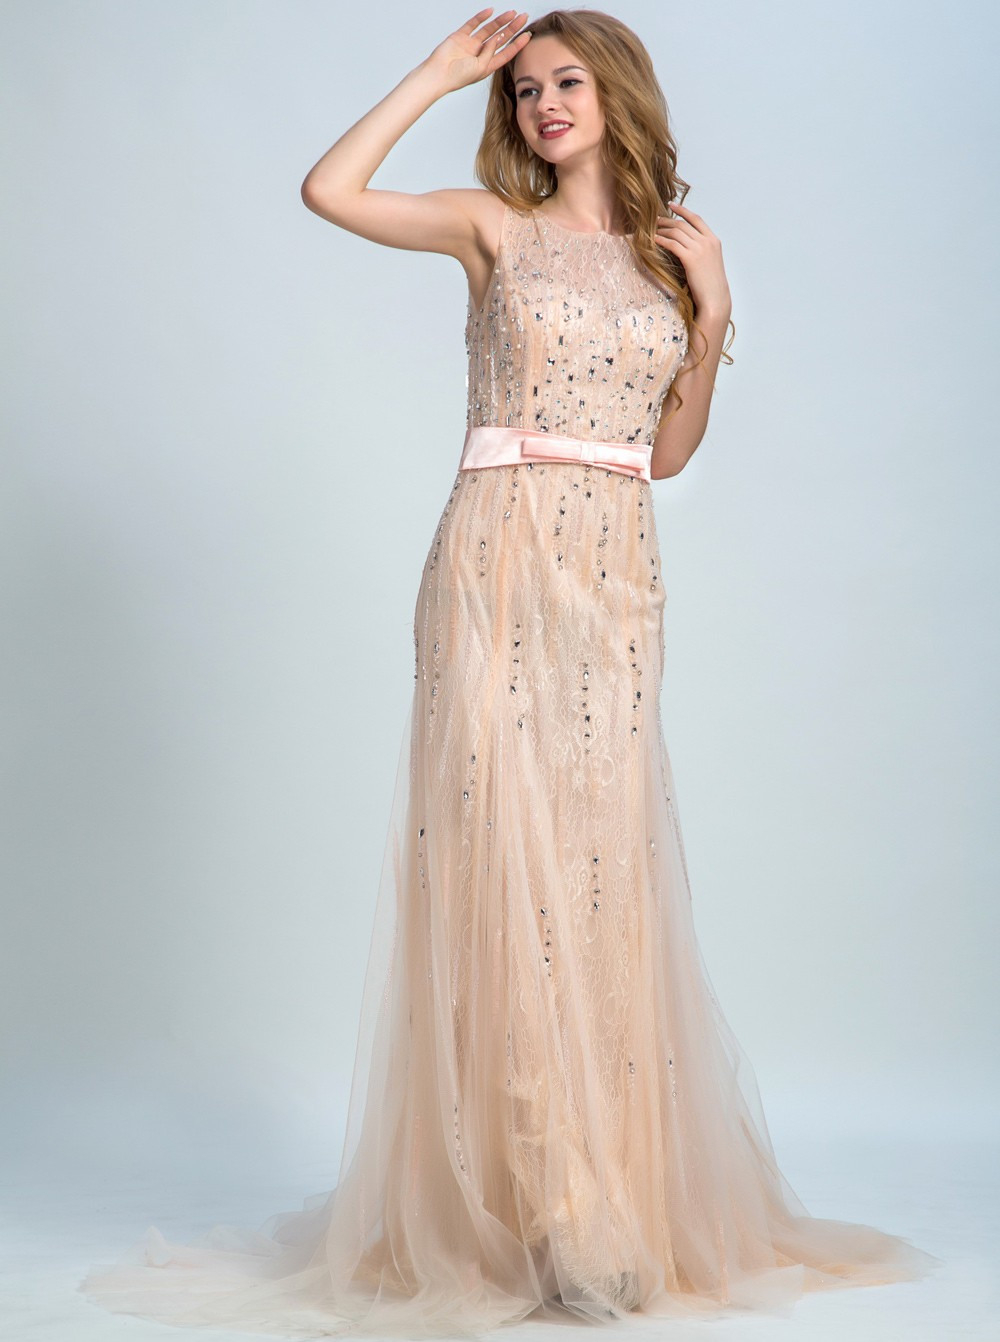 13 Genial Abendkleid Champagner Lang Stylish10 Luxurius Abendkleid Champagner Lang Design